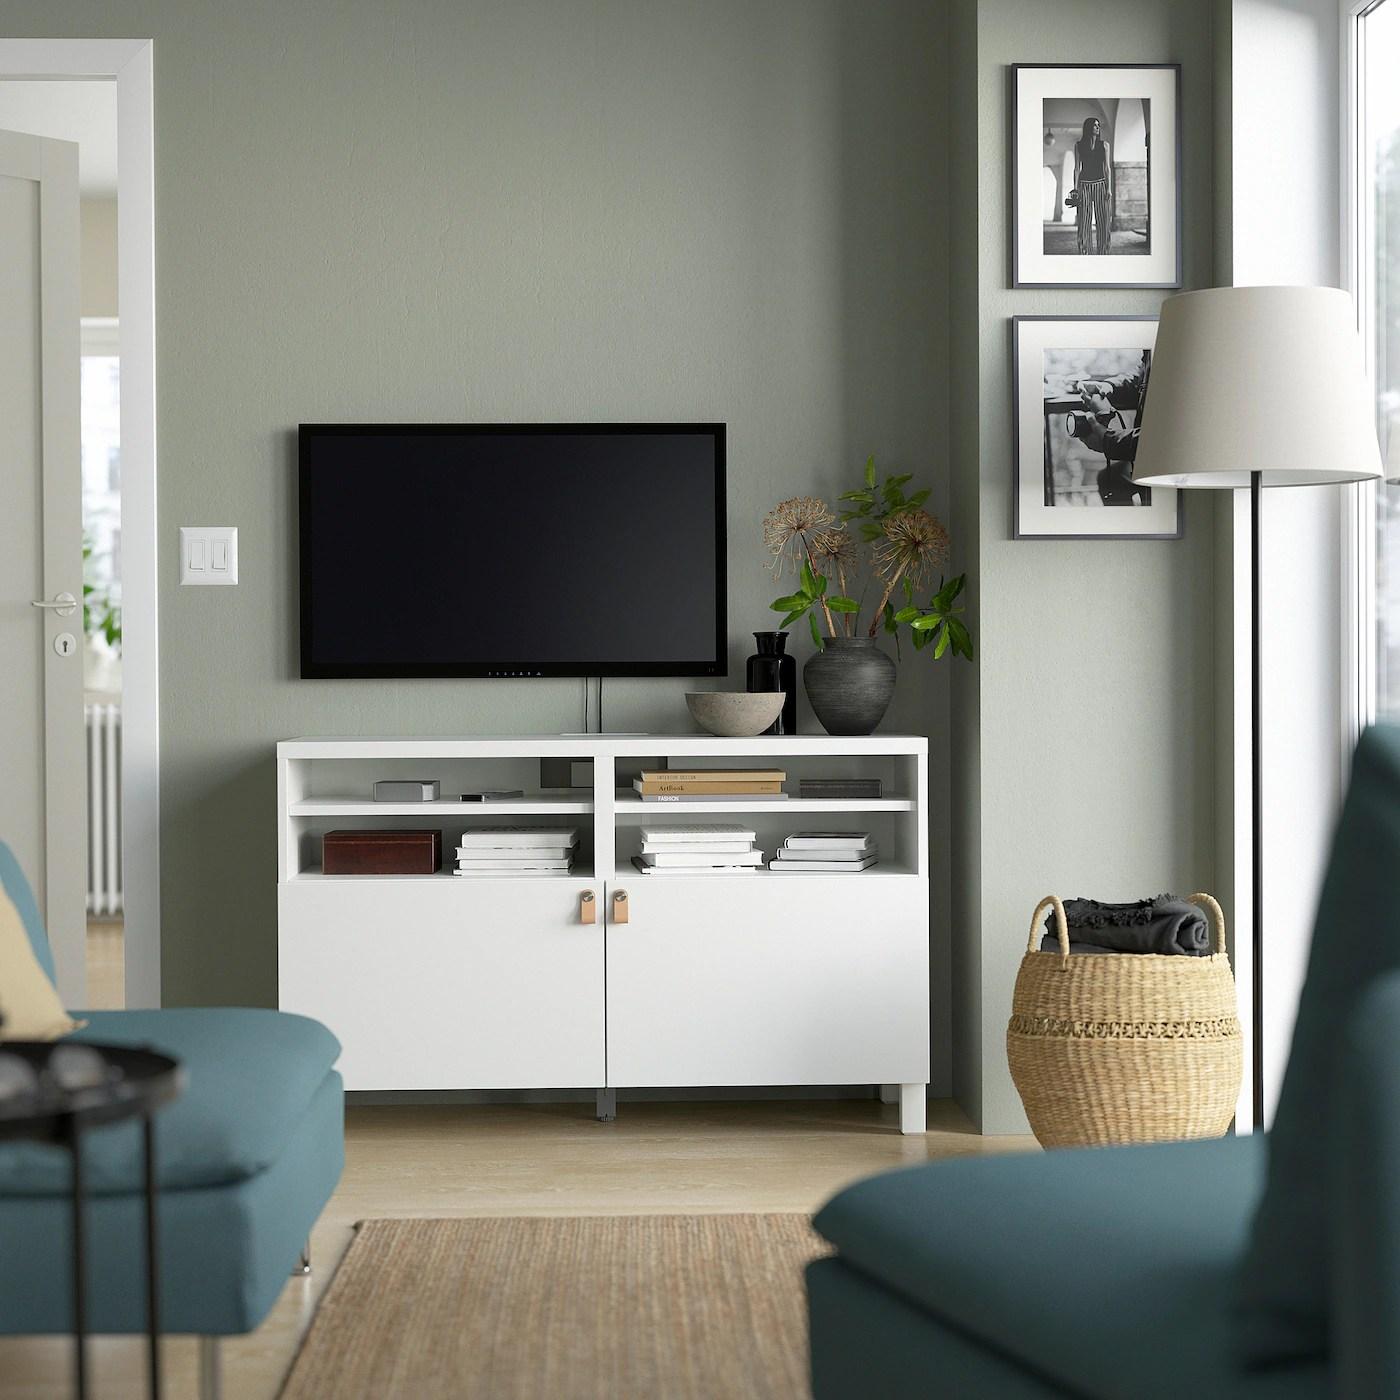 Besta Banc Tv Avec Portes Lappviken Blanc Lappviken Stubbarp Blanc 120x42x74 Cm Ikea